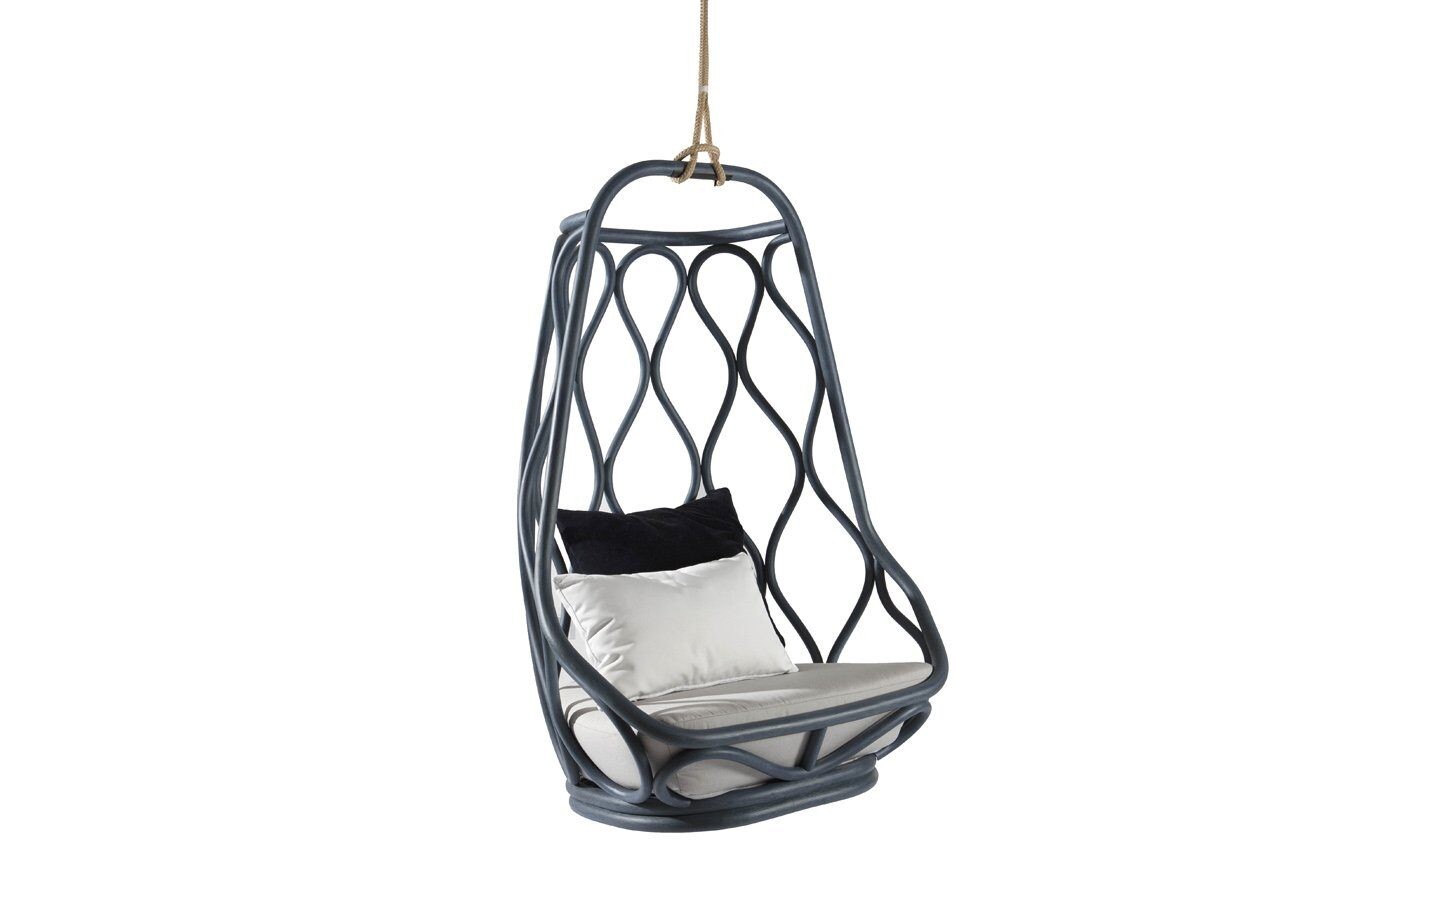 Nautica-Rattan-swing-chair-black-01